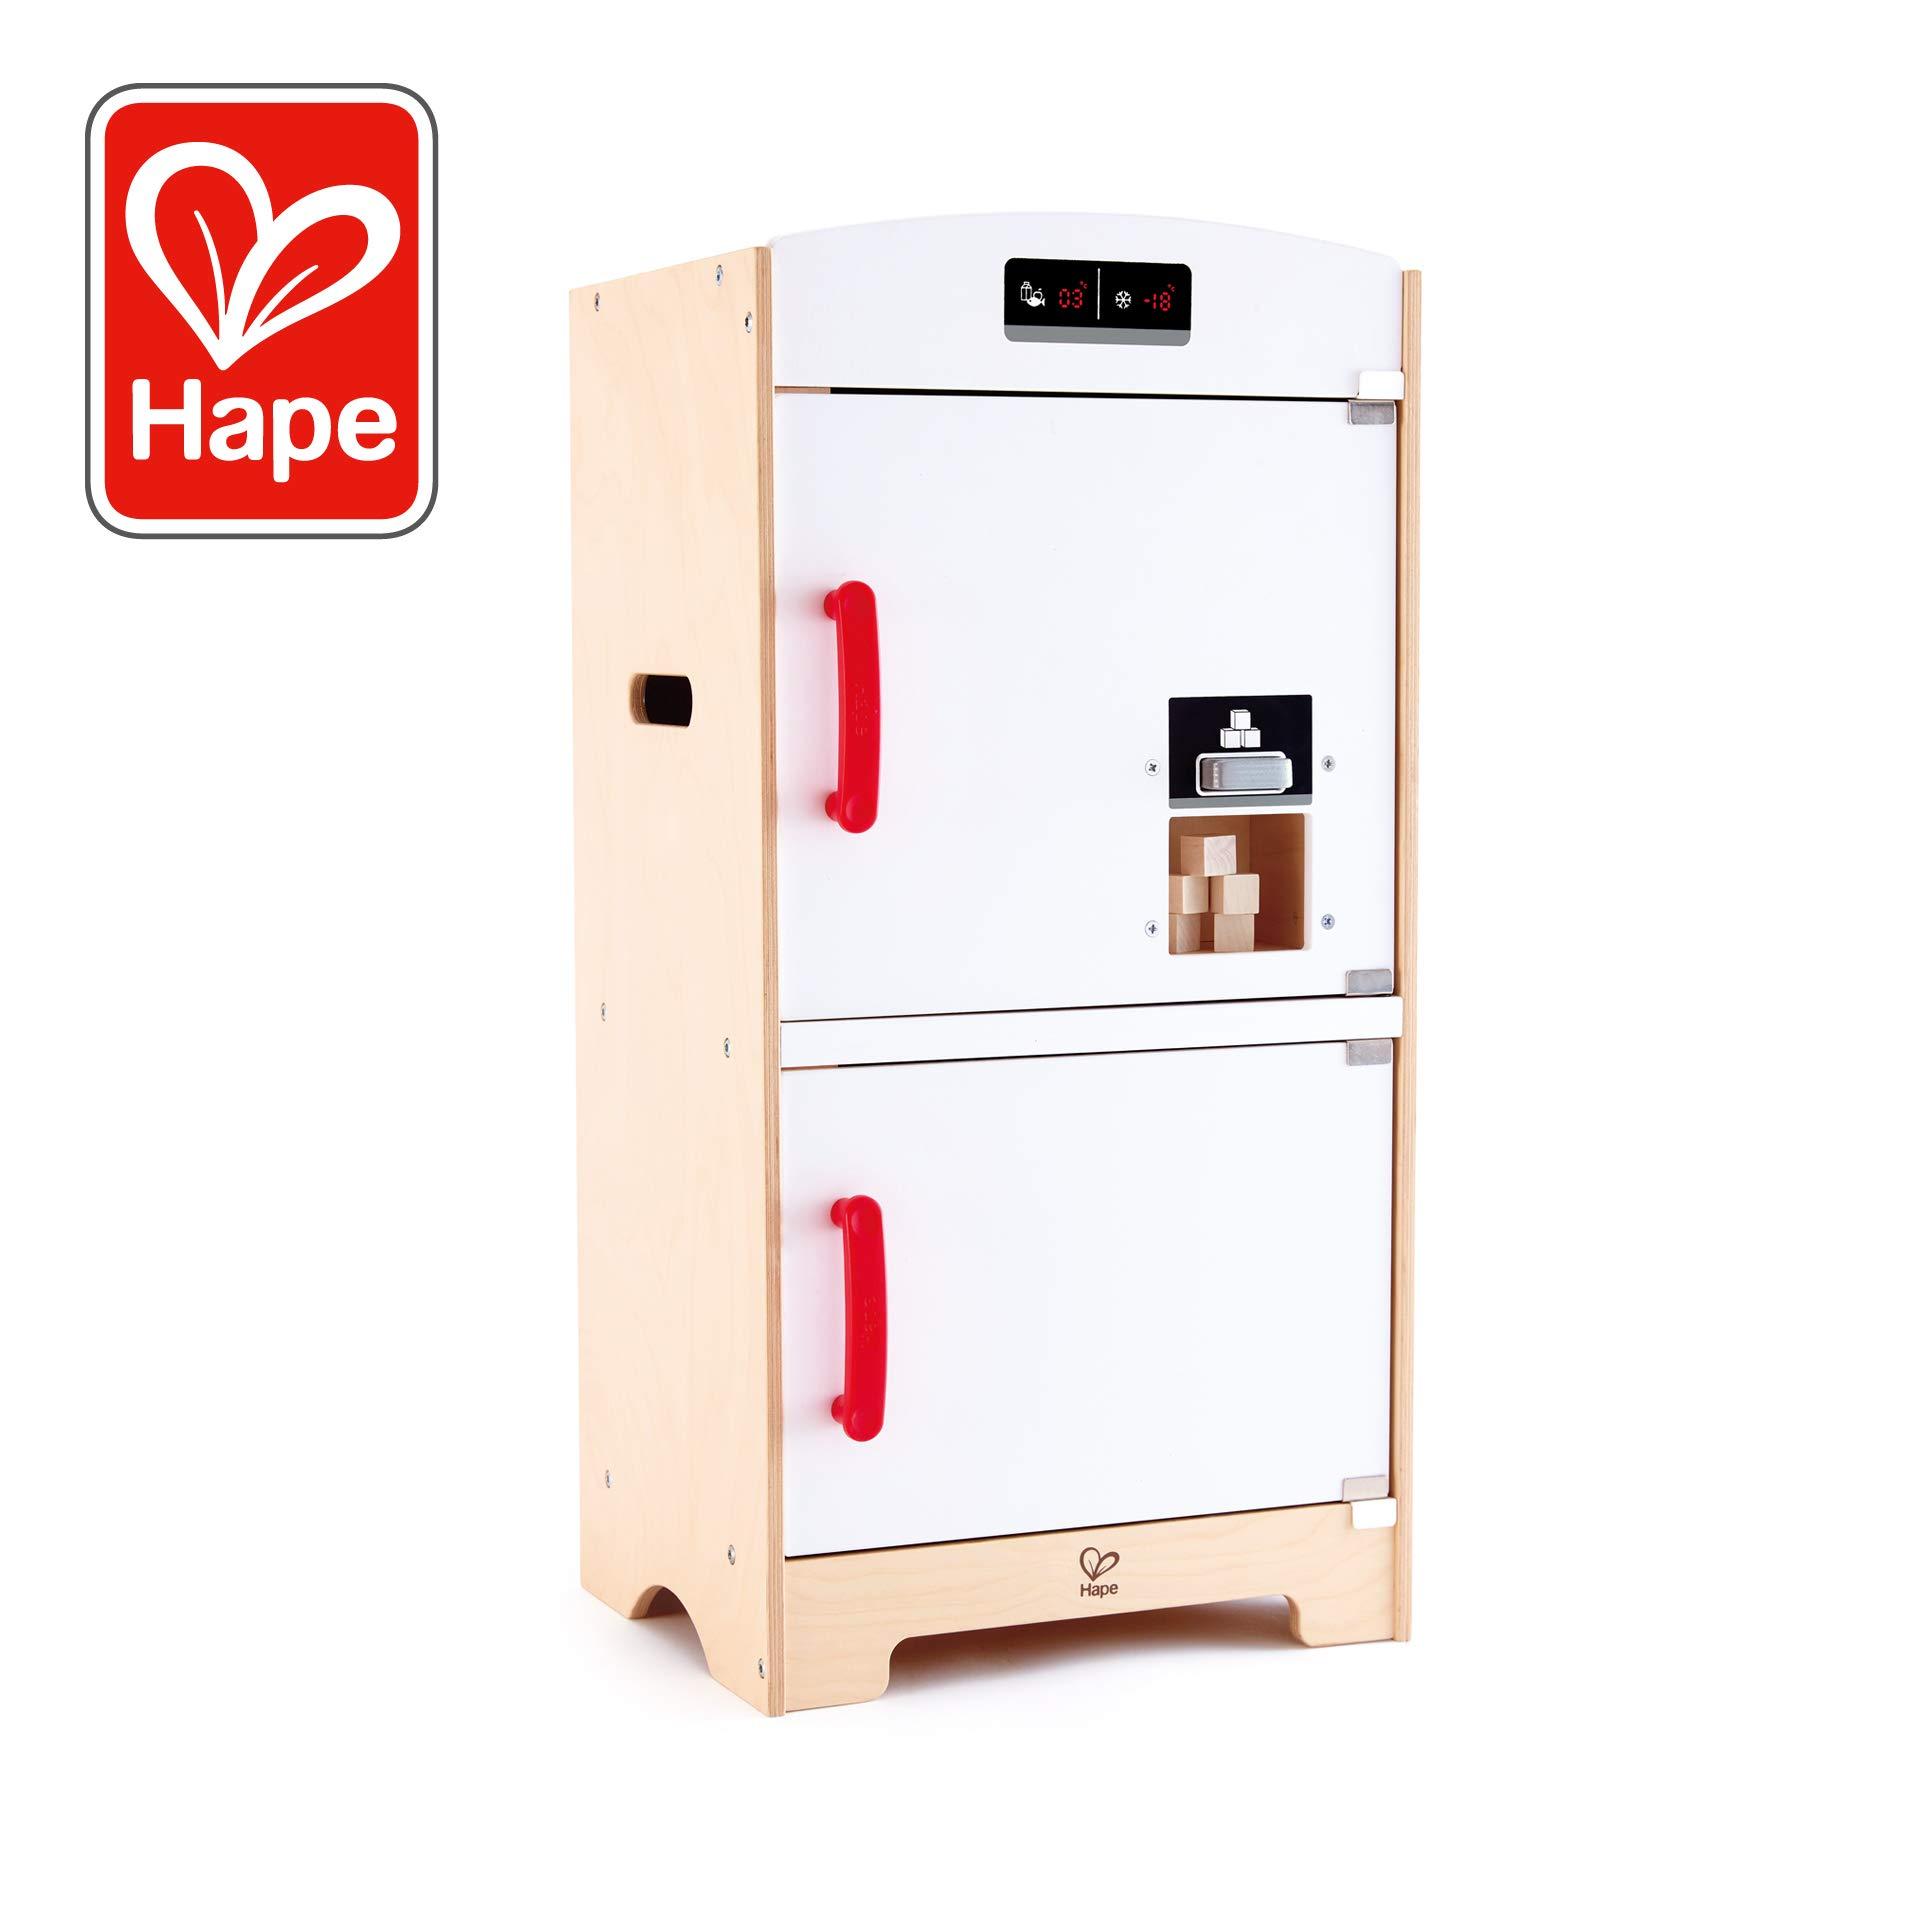 Hape Gourmet Kitchen Wooden Fridge | Cabinet Style Refrigerator Fridge Freezer with Ice Dispenser, Unique Toy Kitchen Playset for Kids